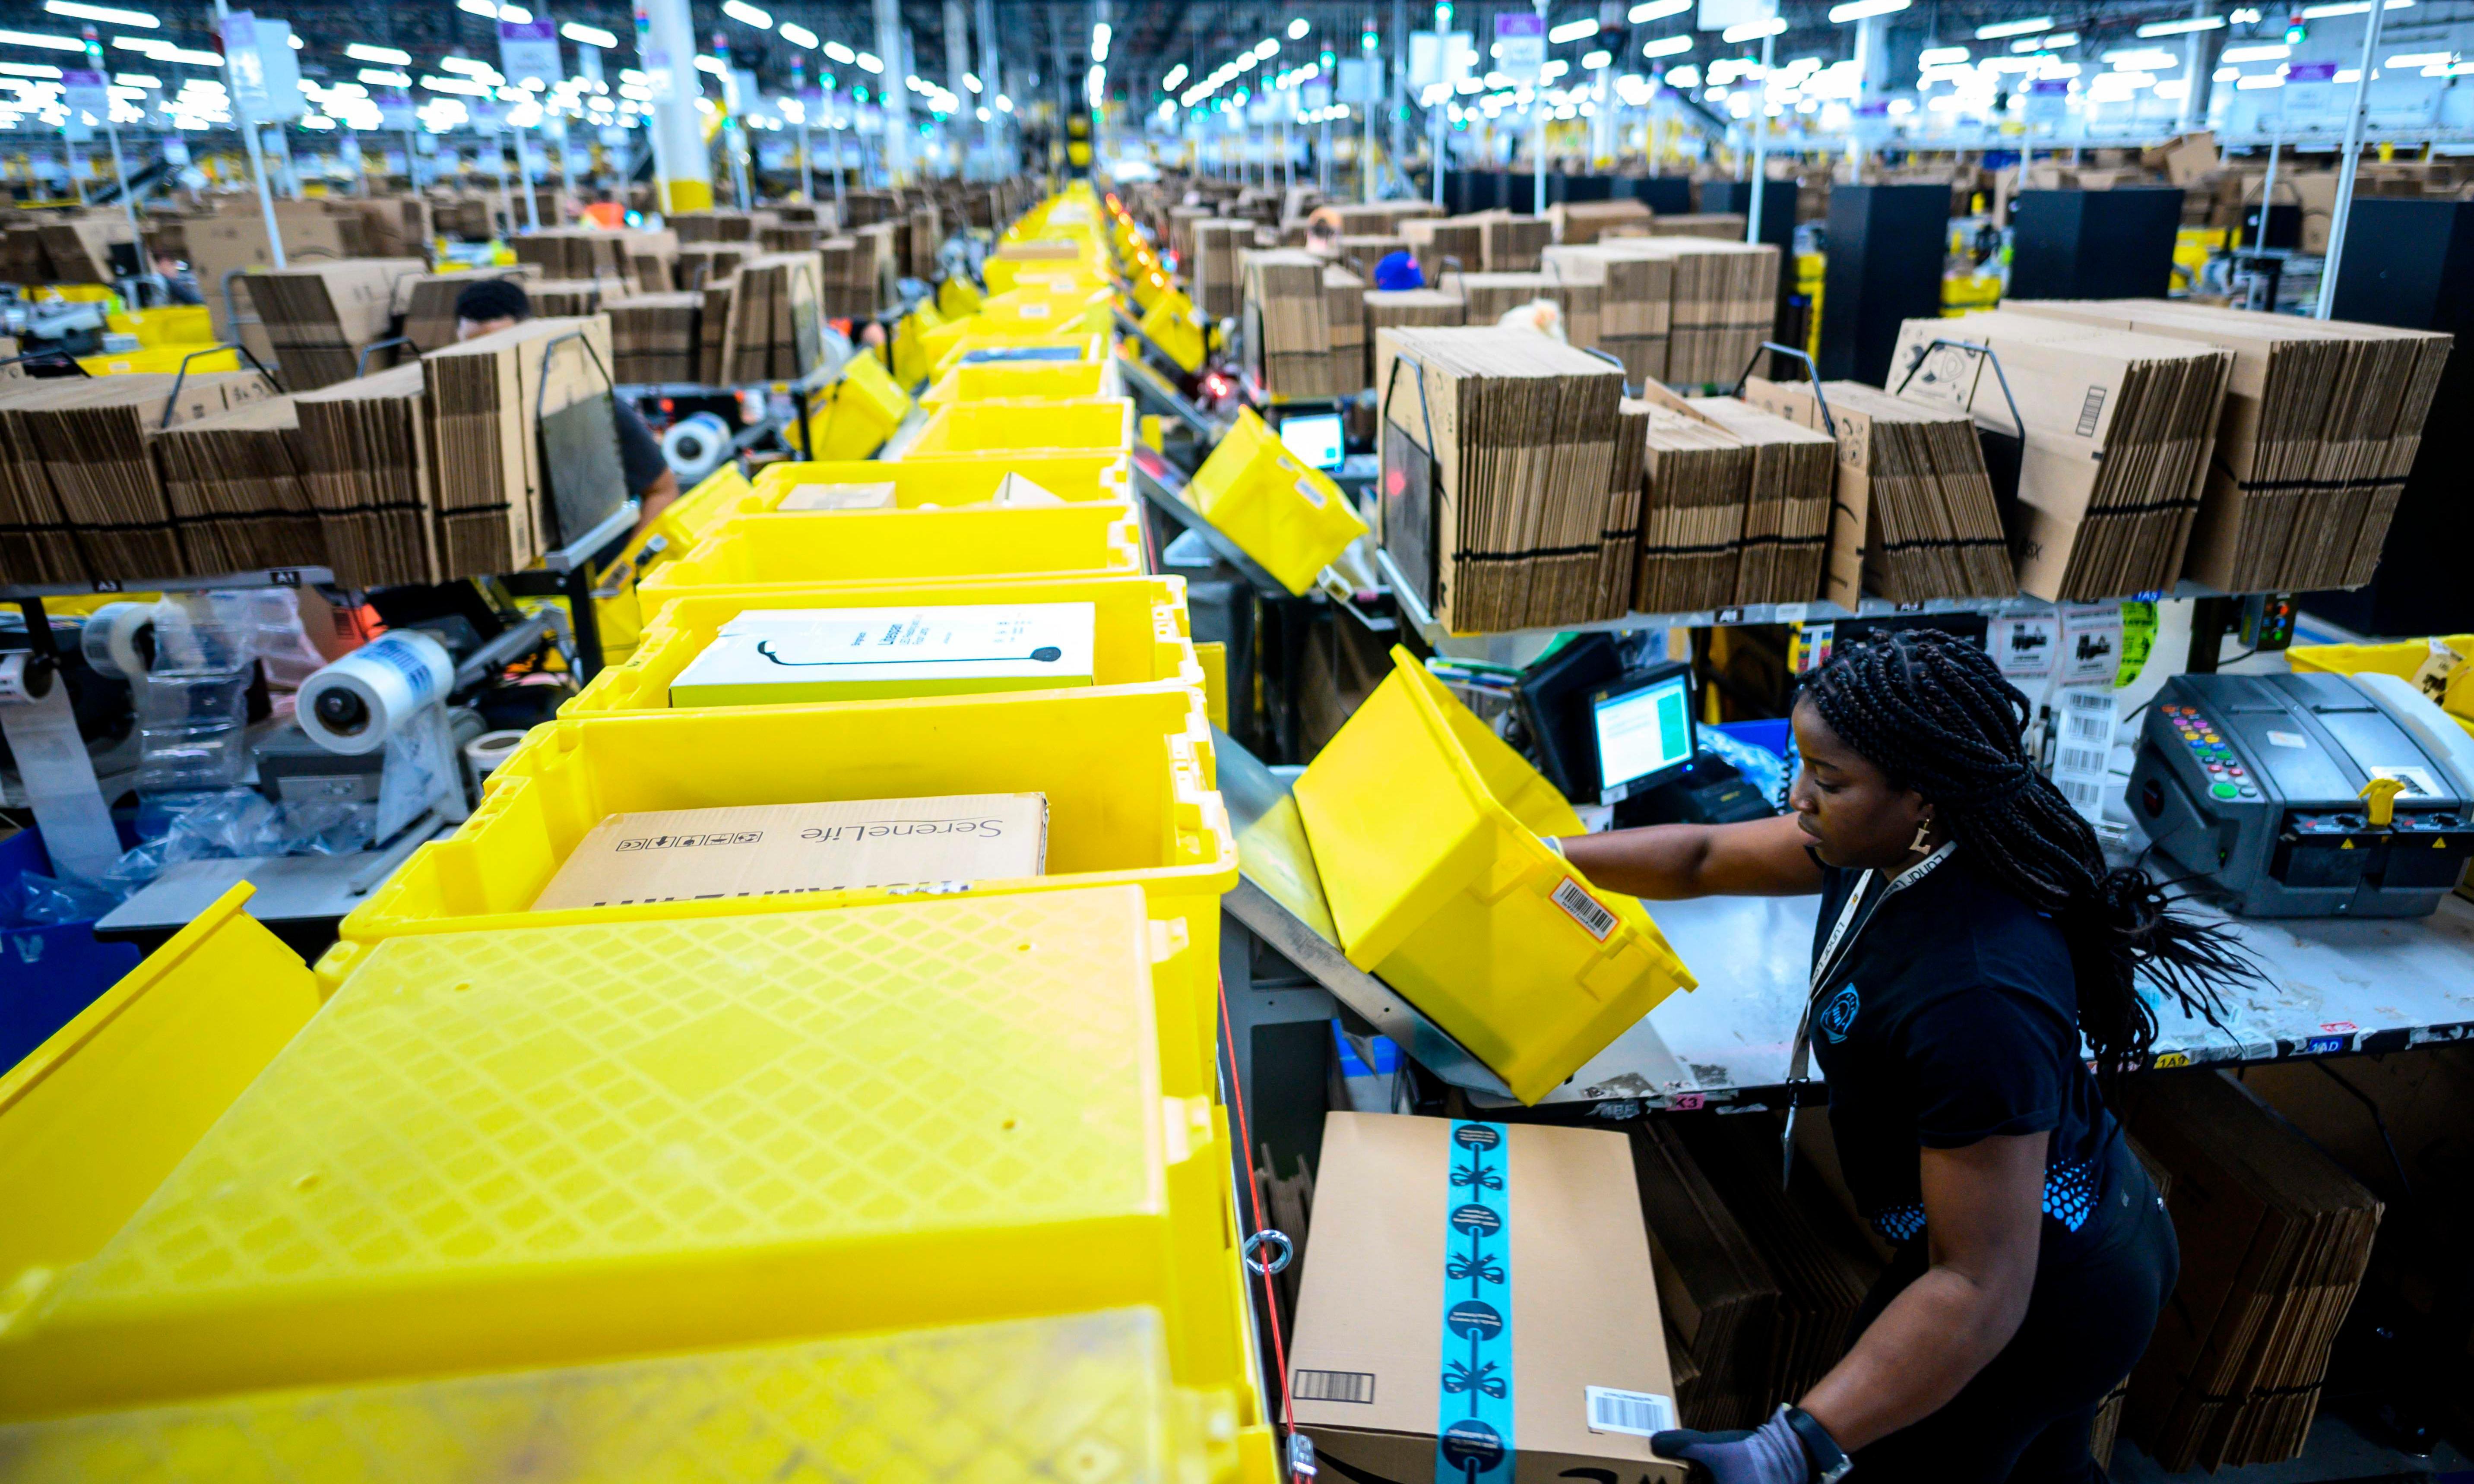 'Go back to work': outcry over deaths on Amazon's warehouse floor